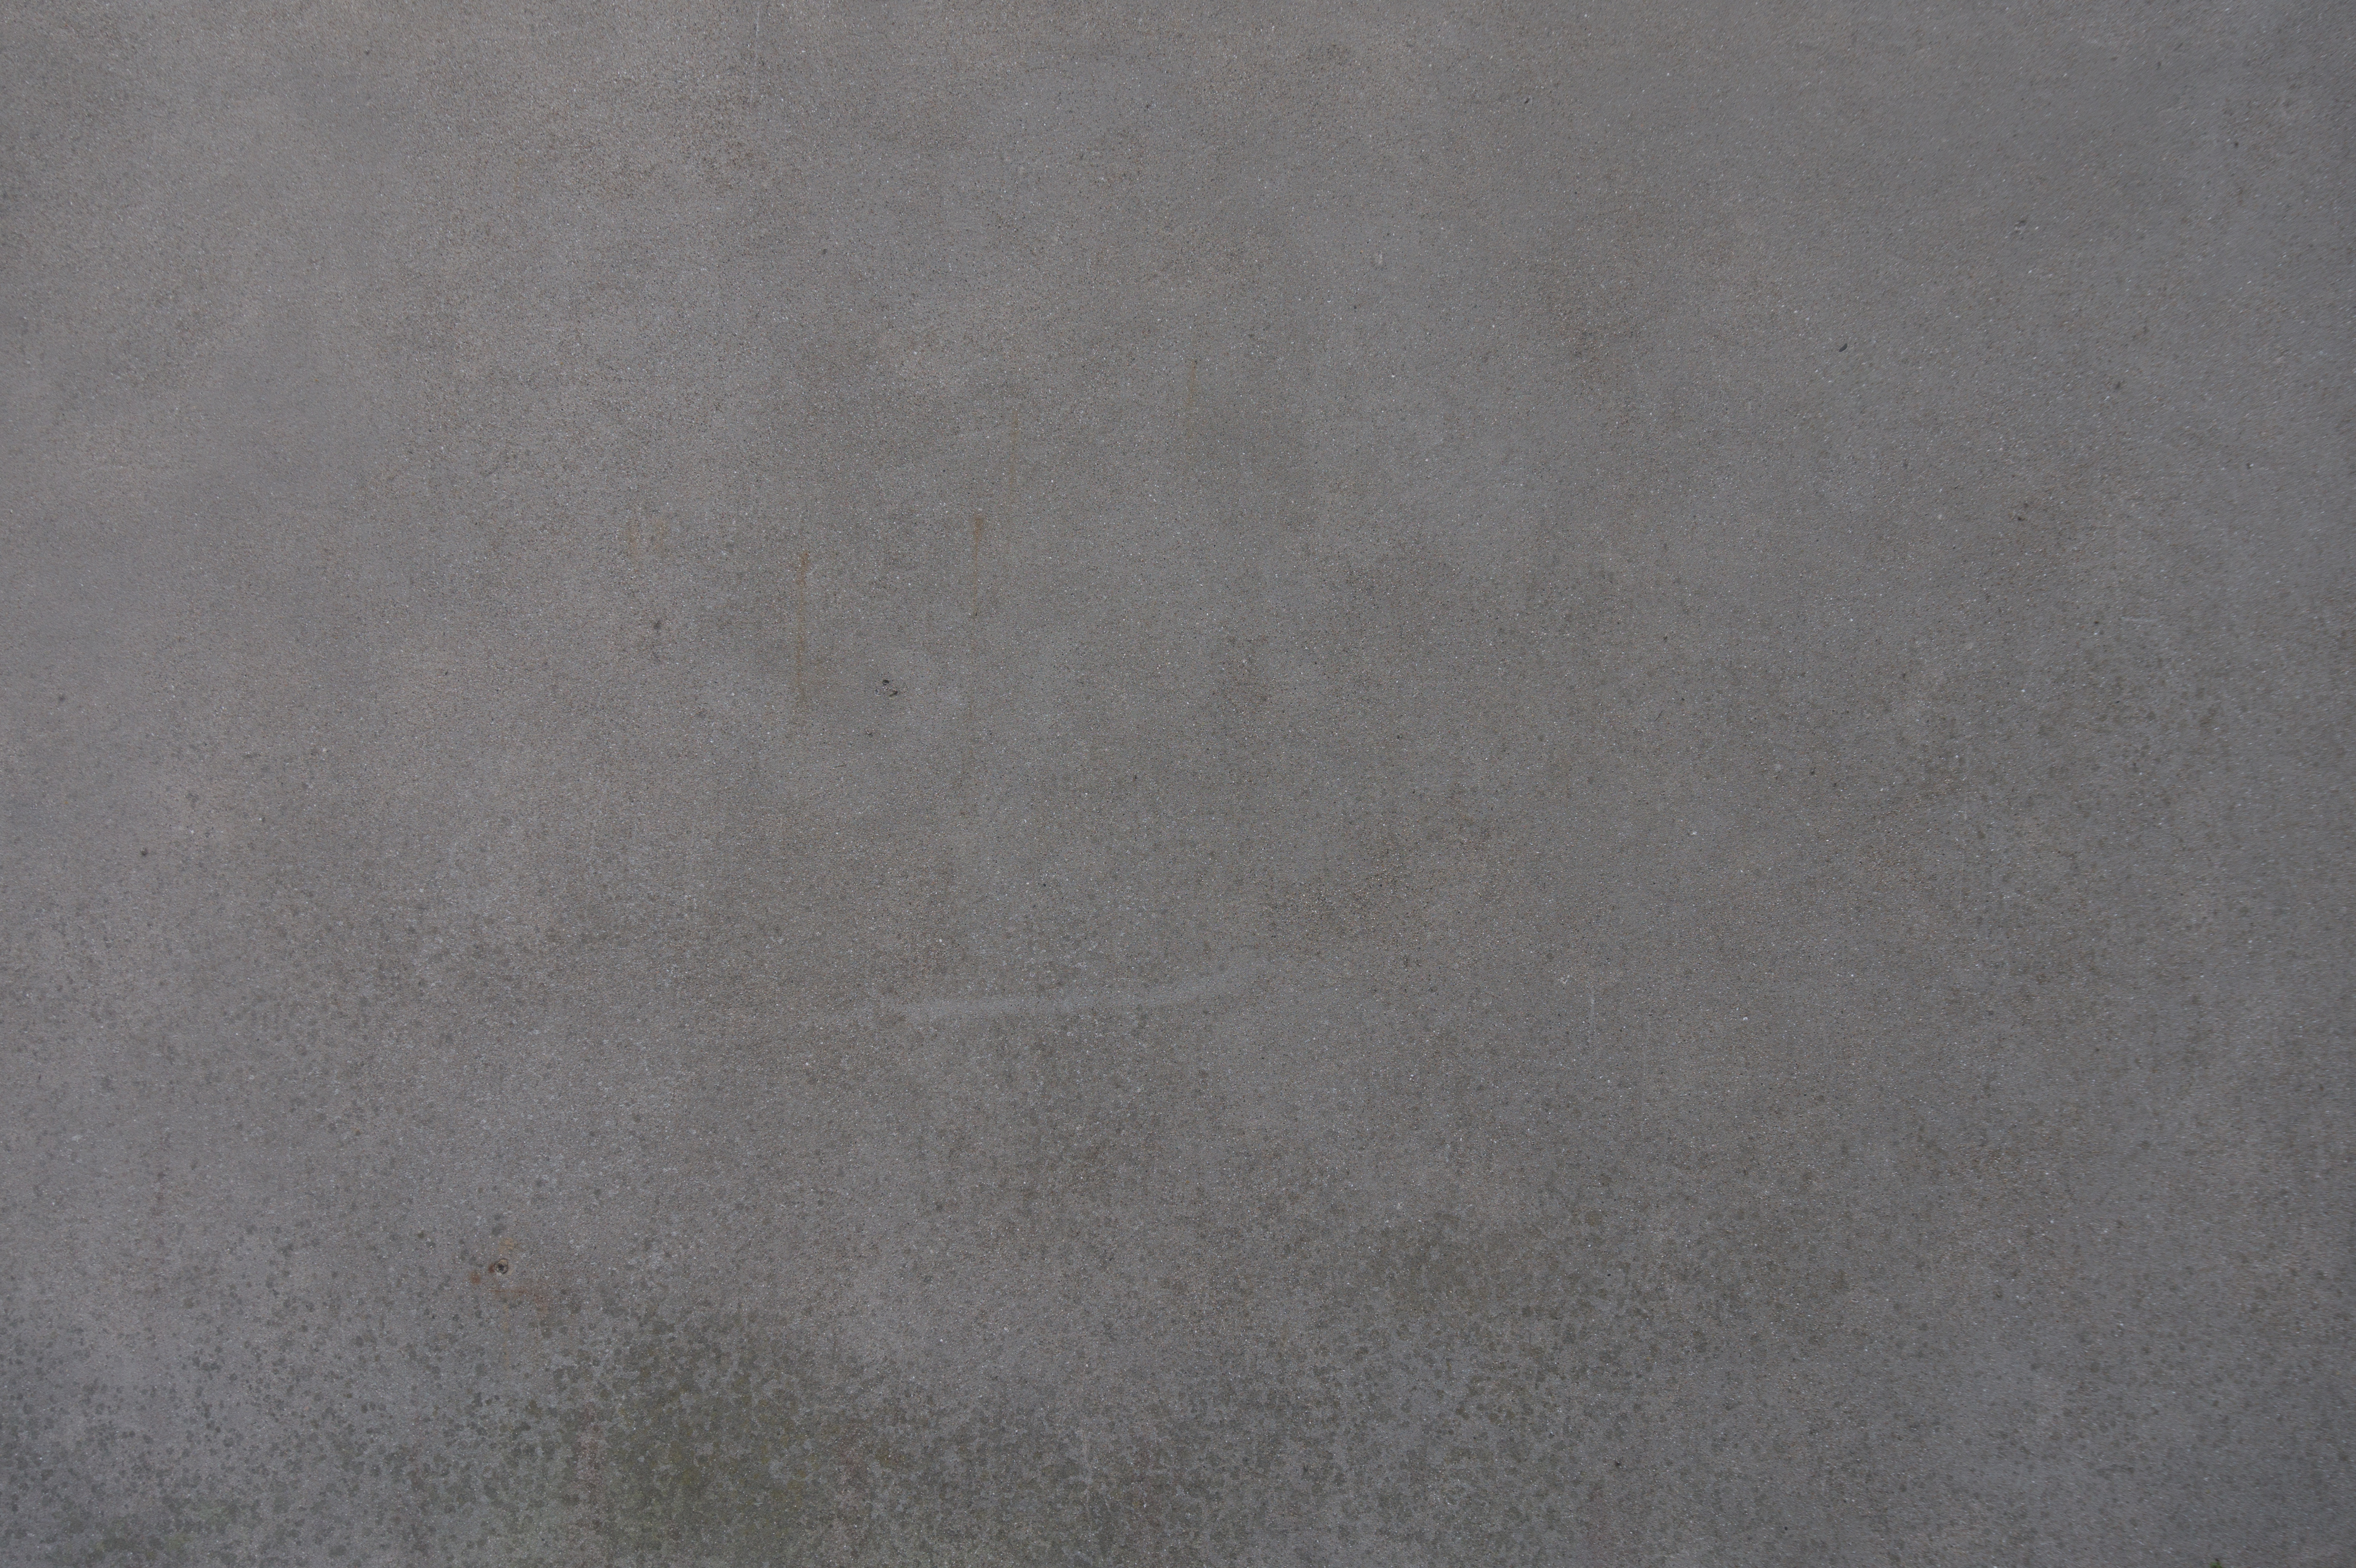 Dark grey plain concrete - Concrete - Texturify - Free textures